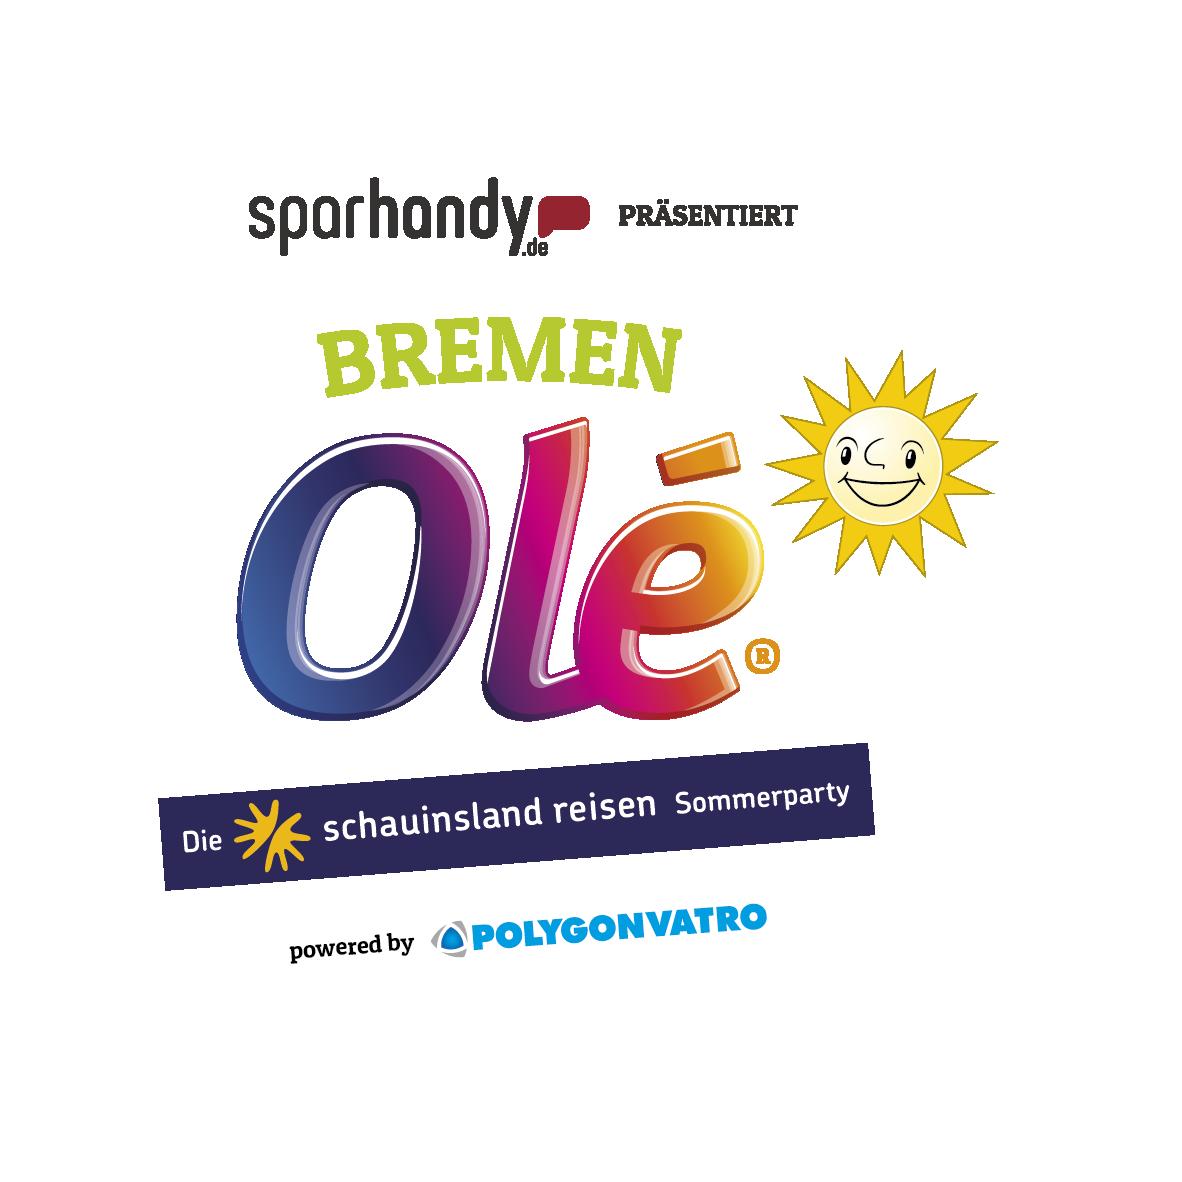 www.oleparty.de/ole-parties/bremen/programm/